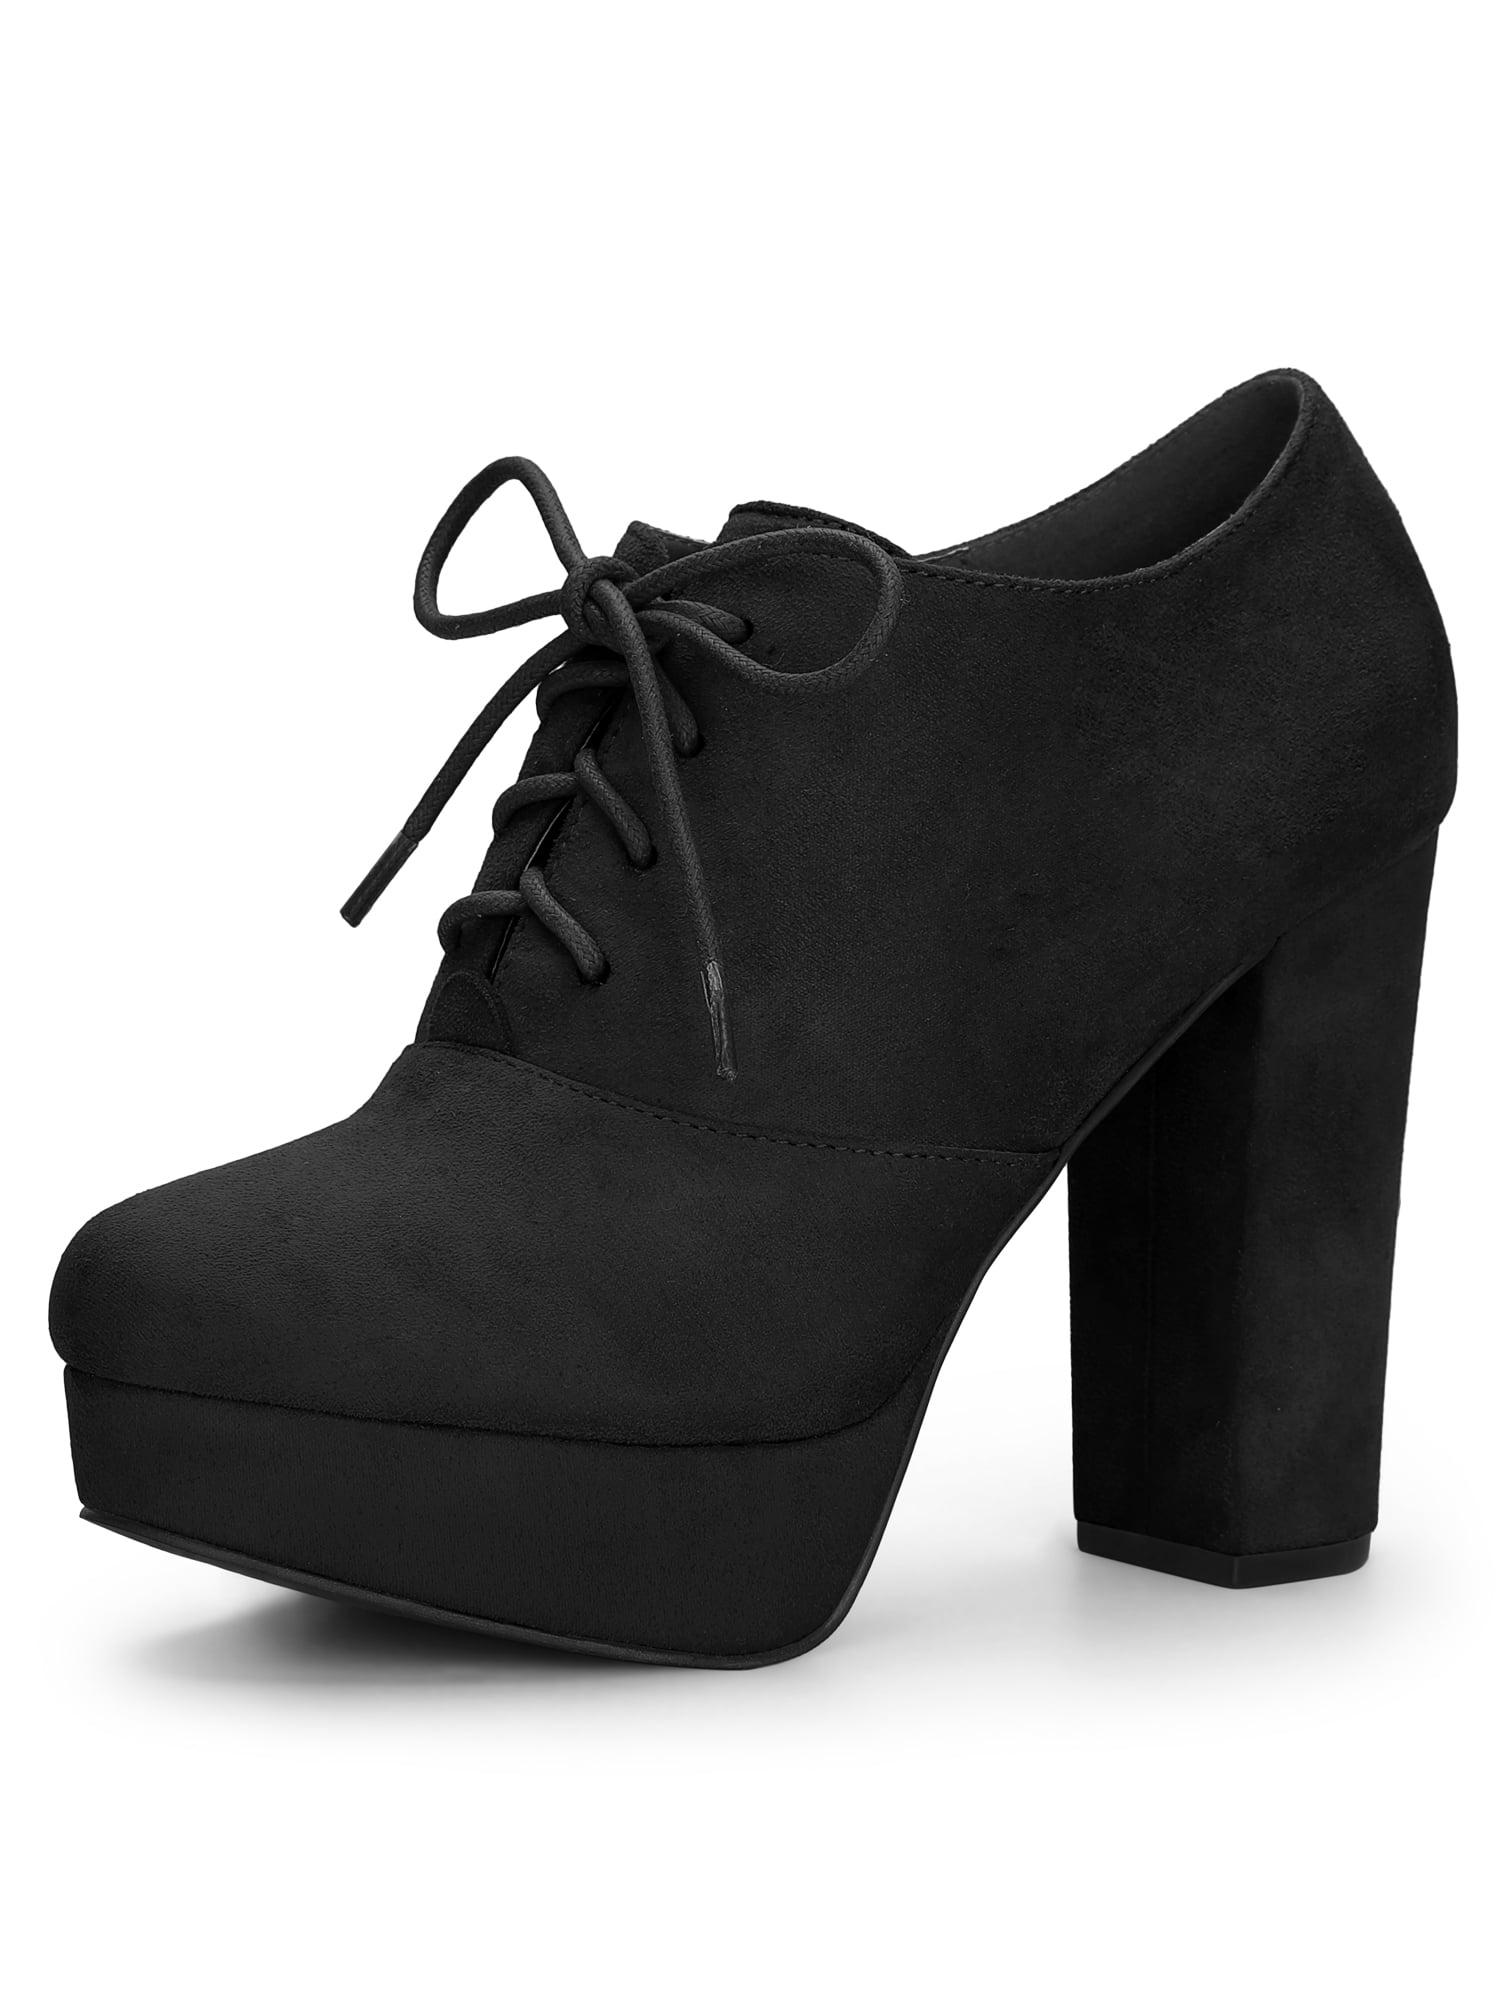 Women's Platform Chunky Heel Lace Up